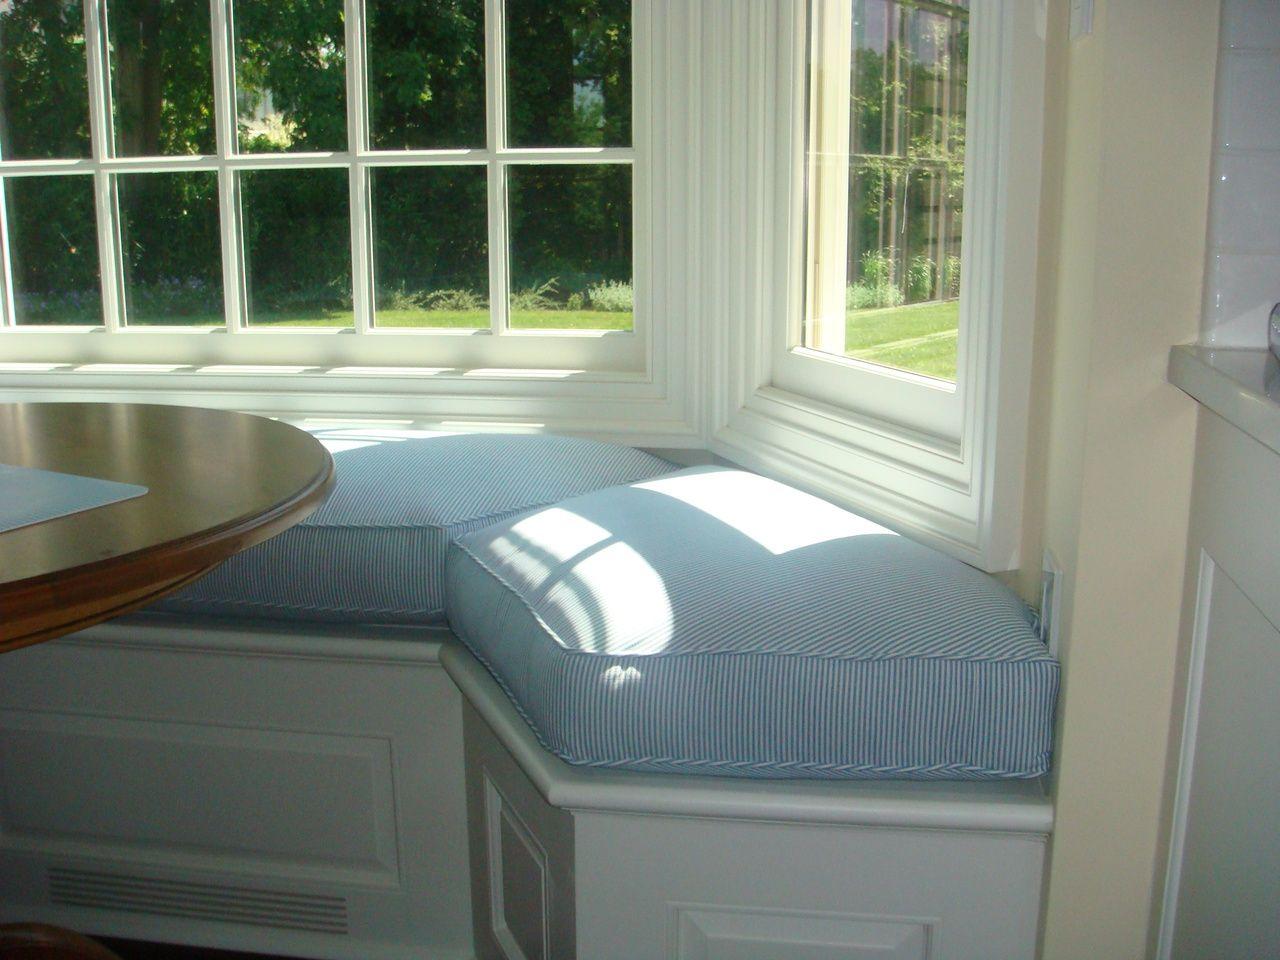 Bay Window Seat Cushion For Kitchen Window Seat Cushions Bay Window Seat Country Furniture